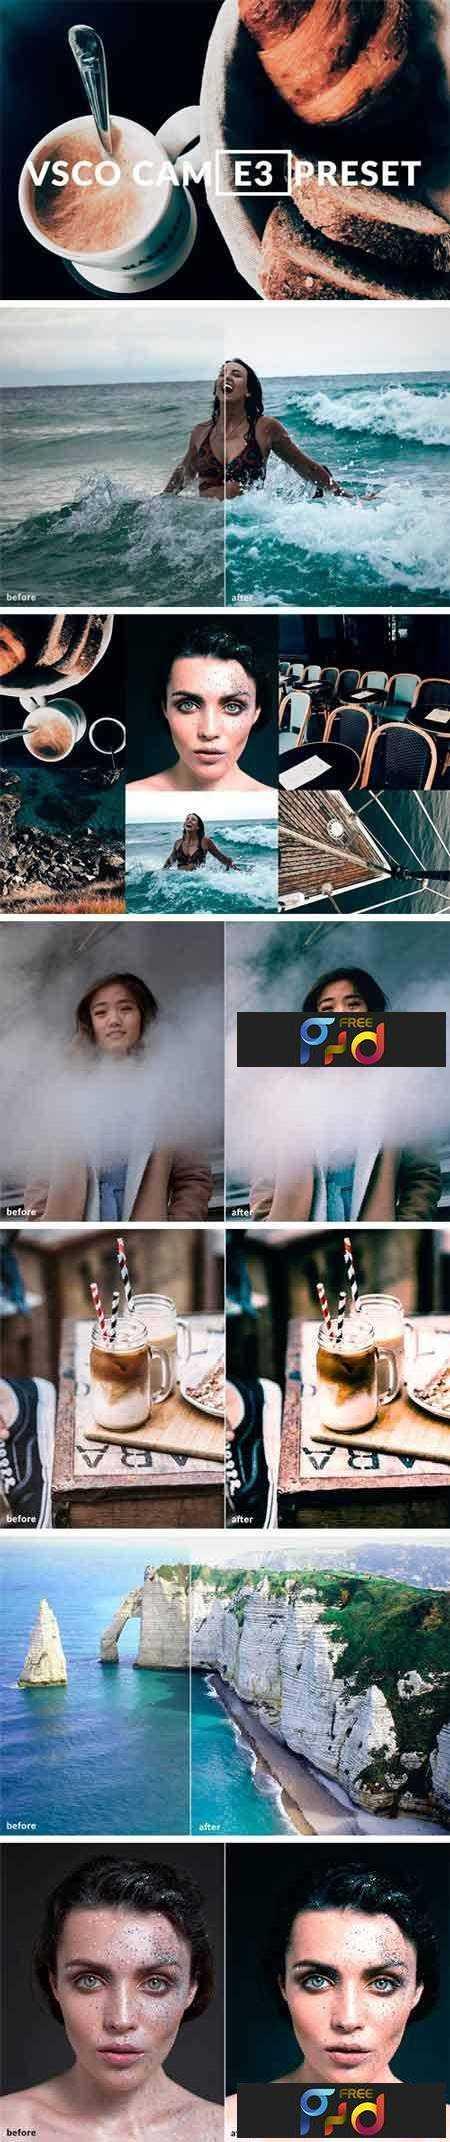 Image Result For Plugin Photoshop Vsco